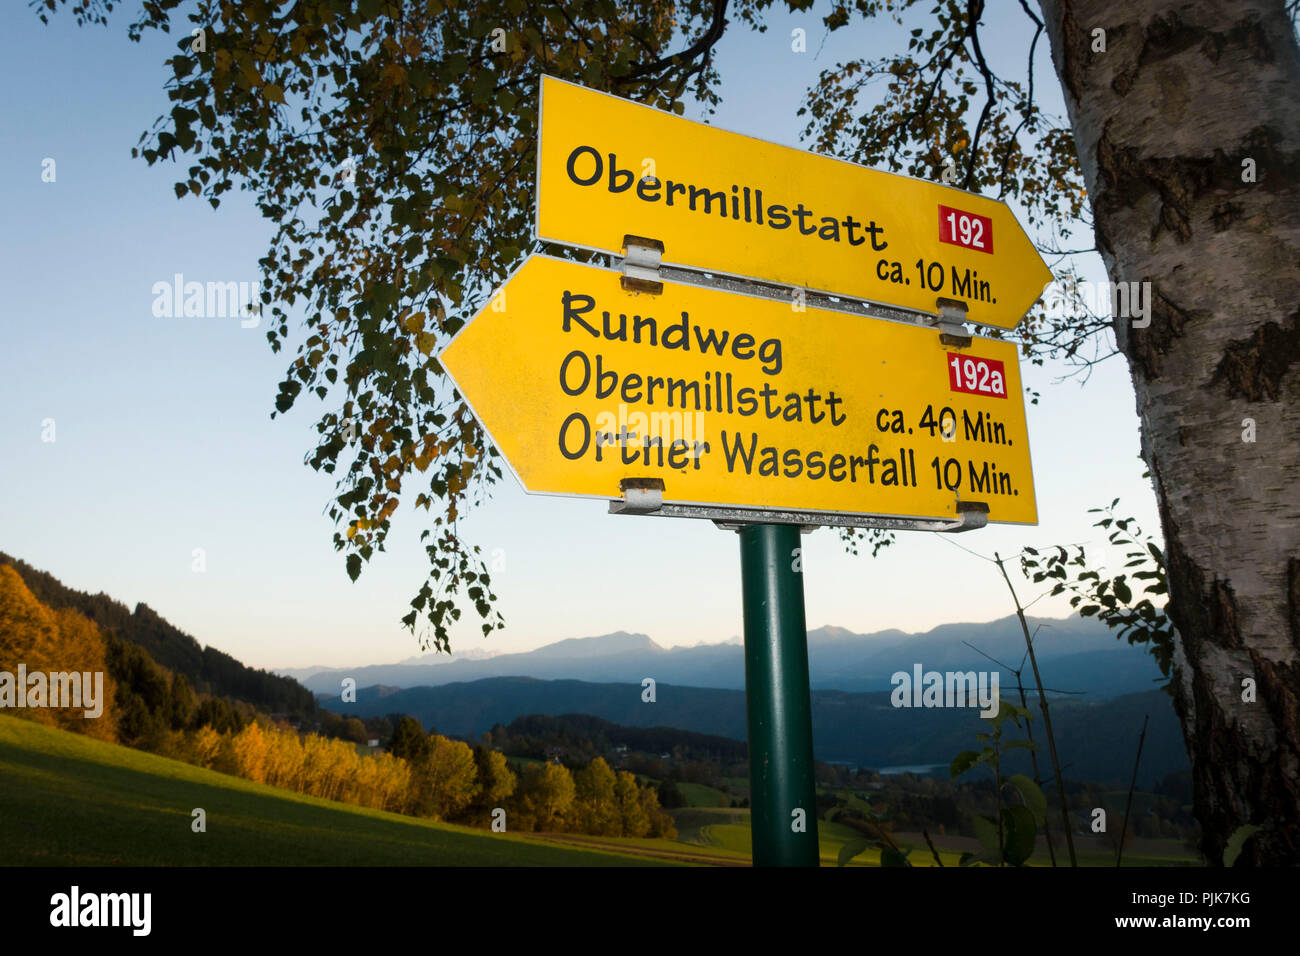 Signpost, Obermillstatt, Lake Millstatt, Carinthia, Austria - Stock Image